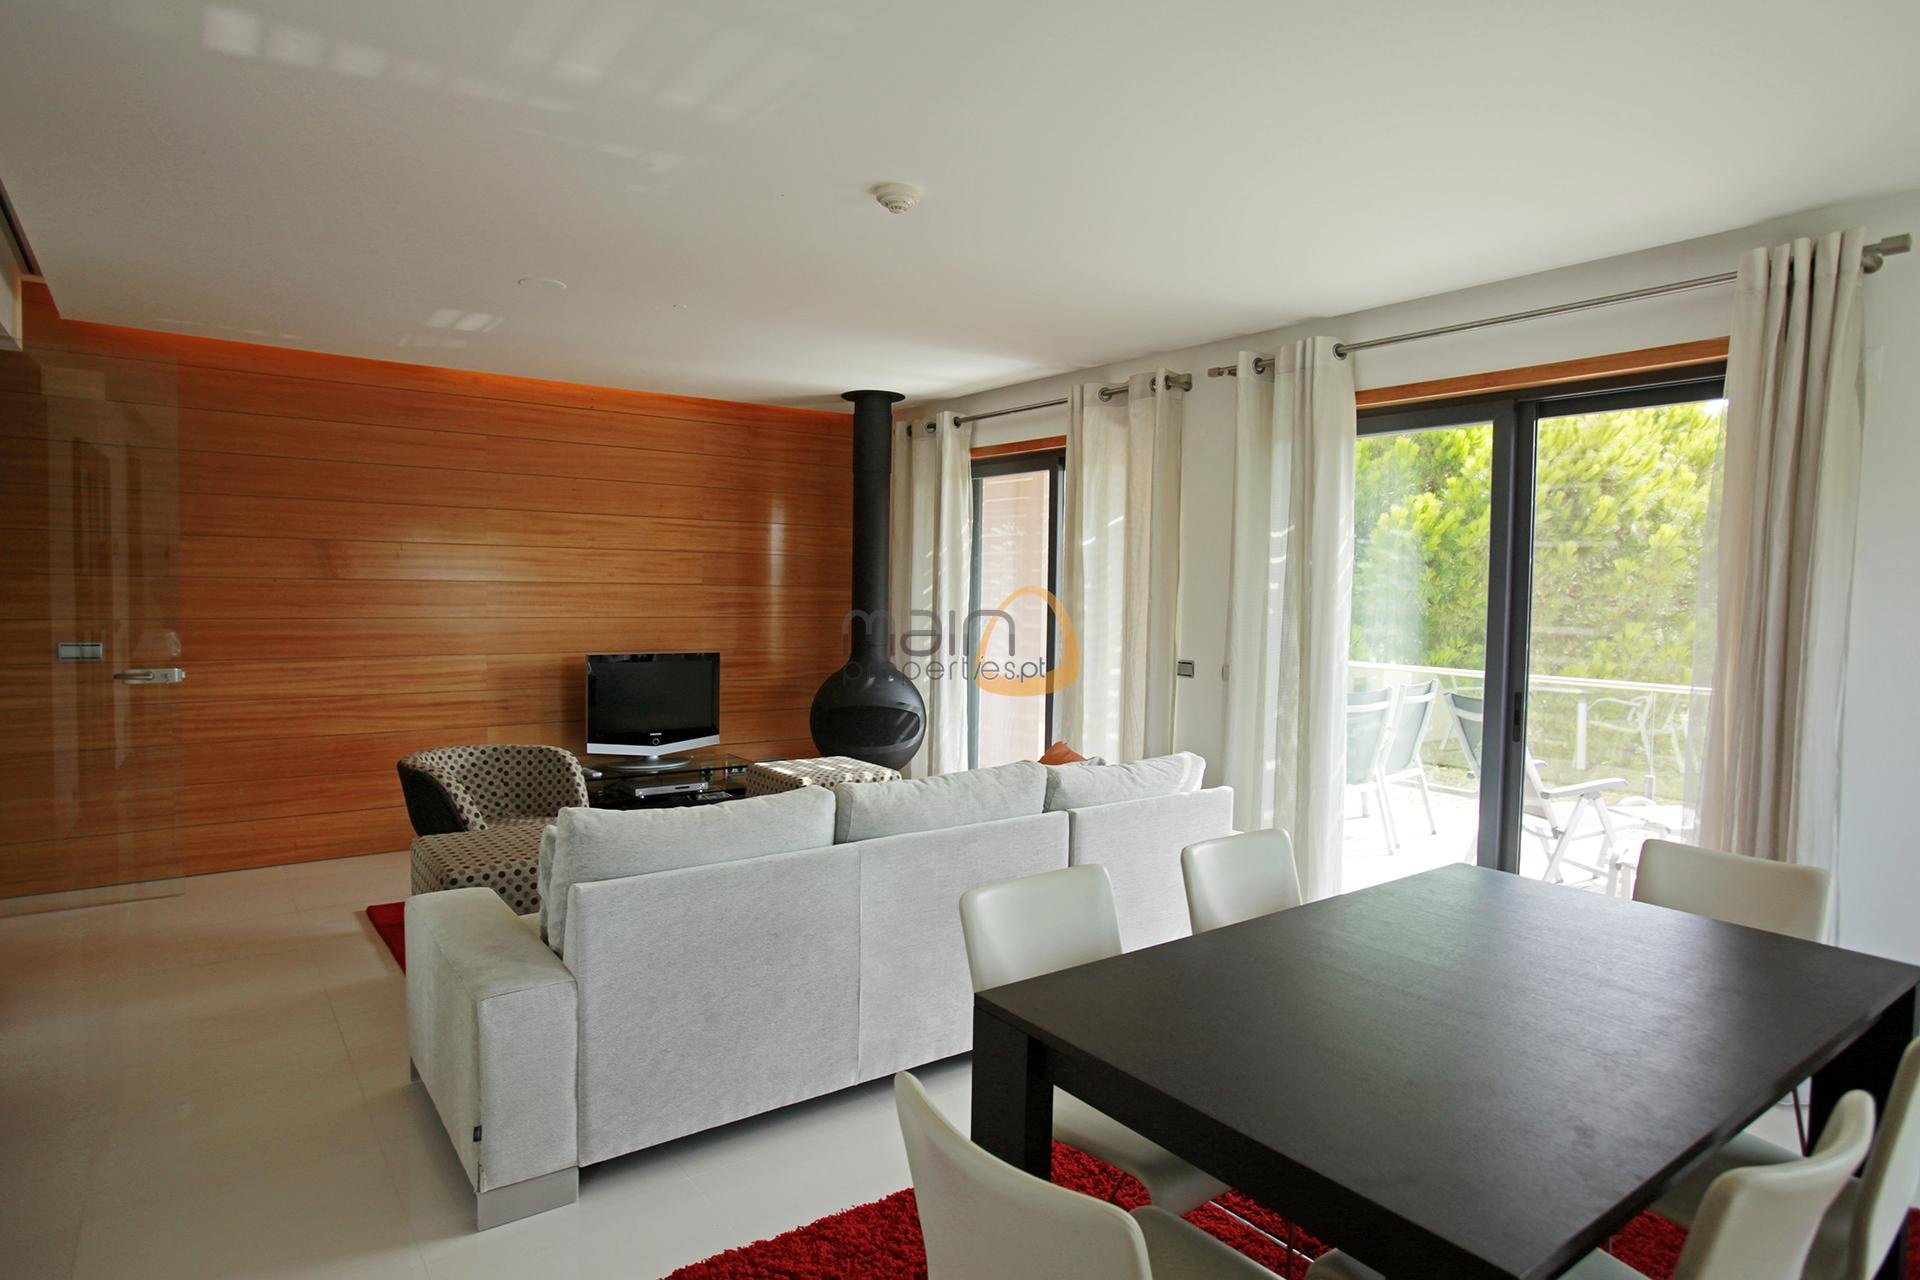 apartment-in-vale-do-lobo-algarve-golden-triangle-portugal-property-real-estate-mainproperties-mp135vdl-2